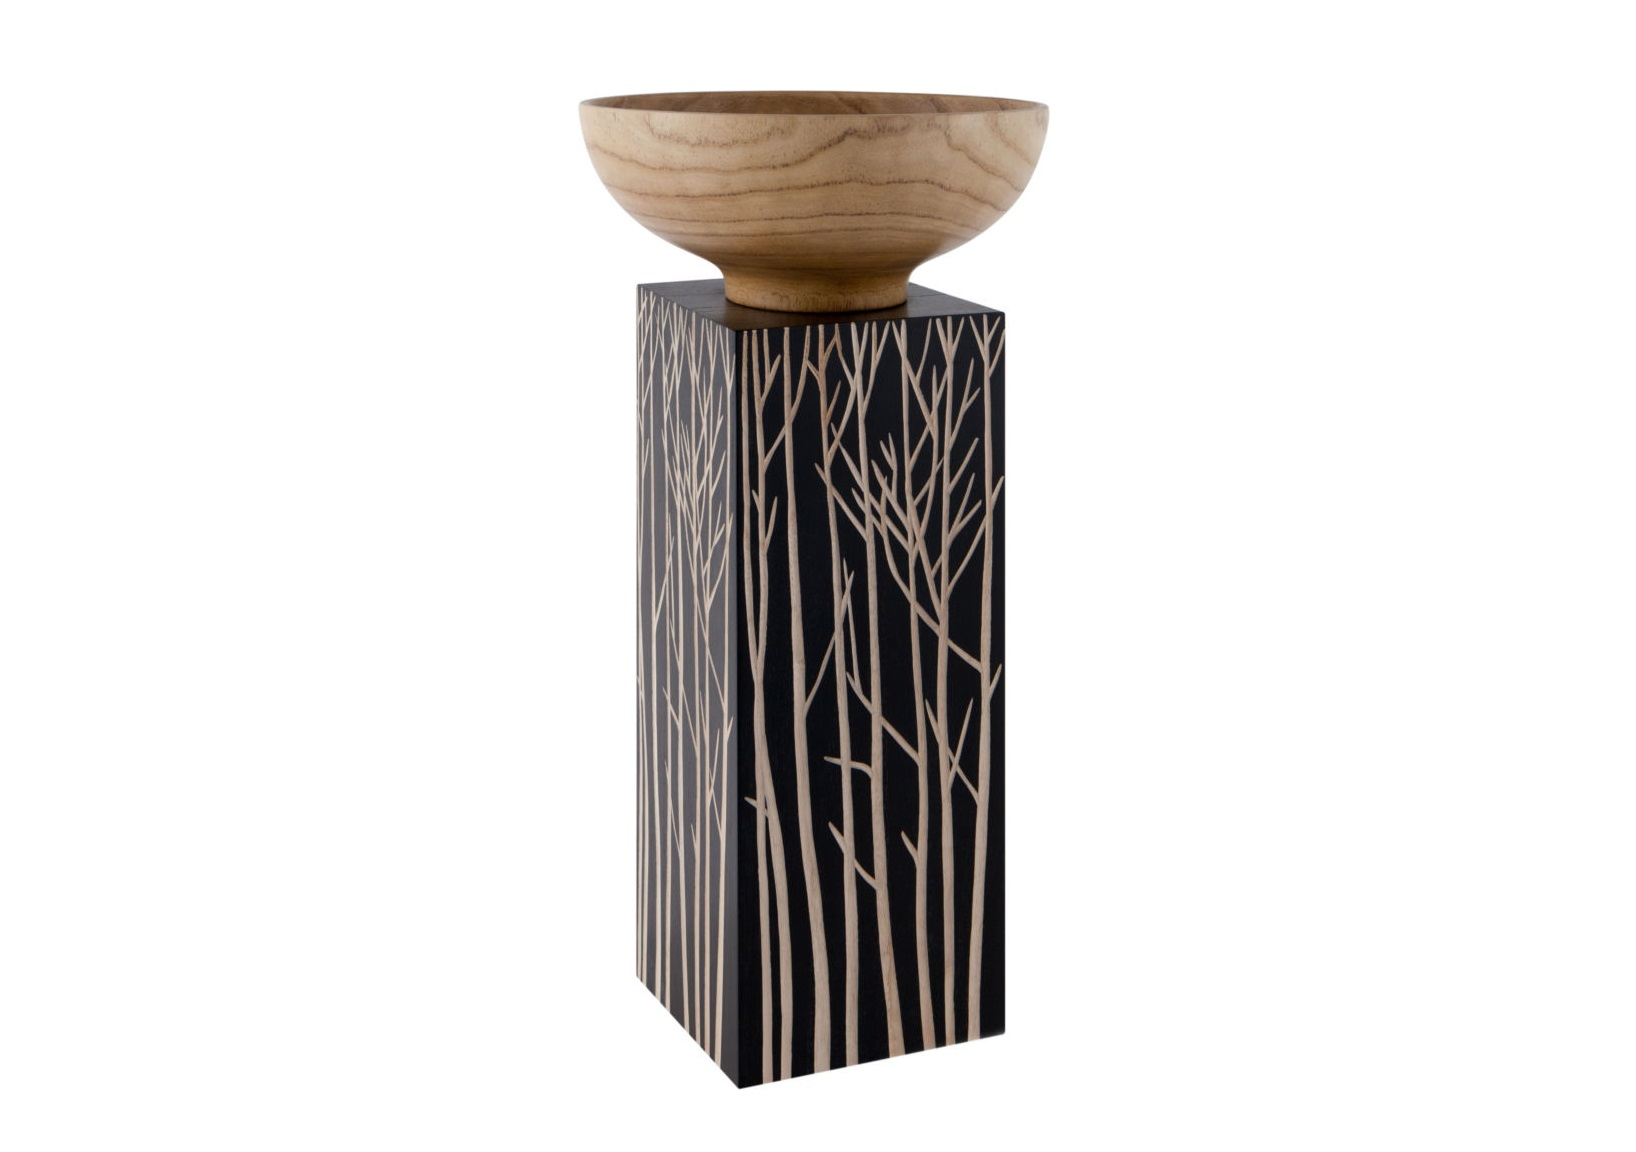 Ваза настольнаяВазы<br><br><br>Material: Керамика<br>Ширина см: 34<br>Высота см: 65<br>Глубина см: 34